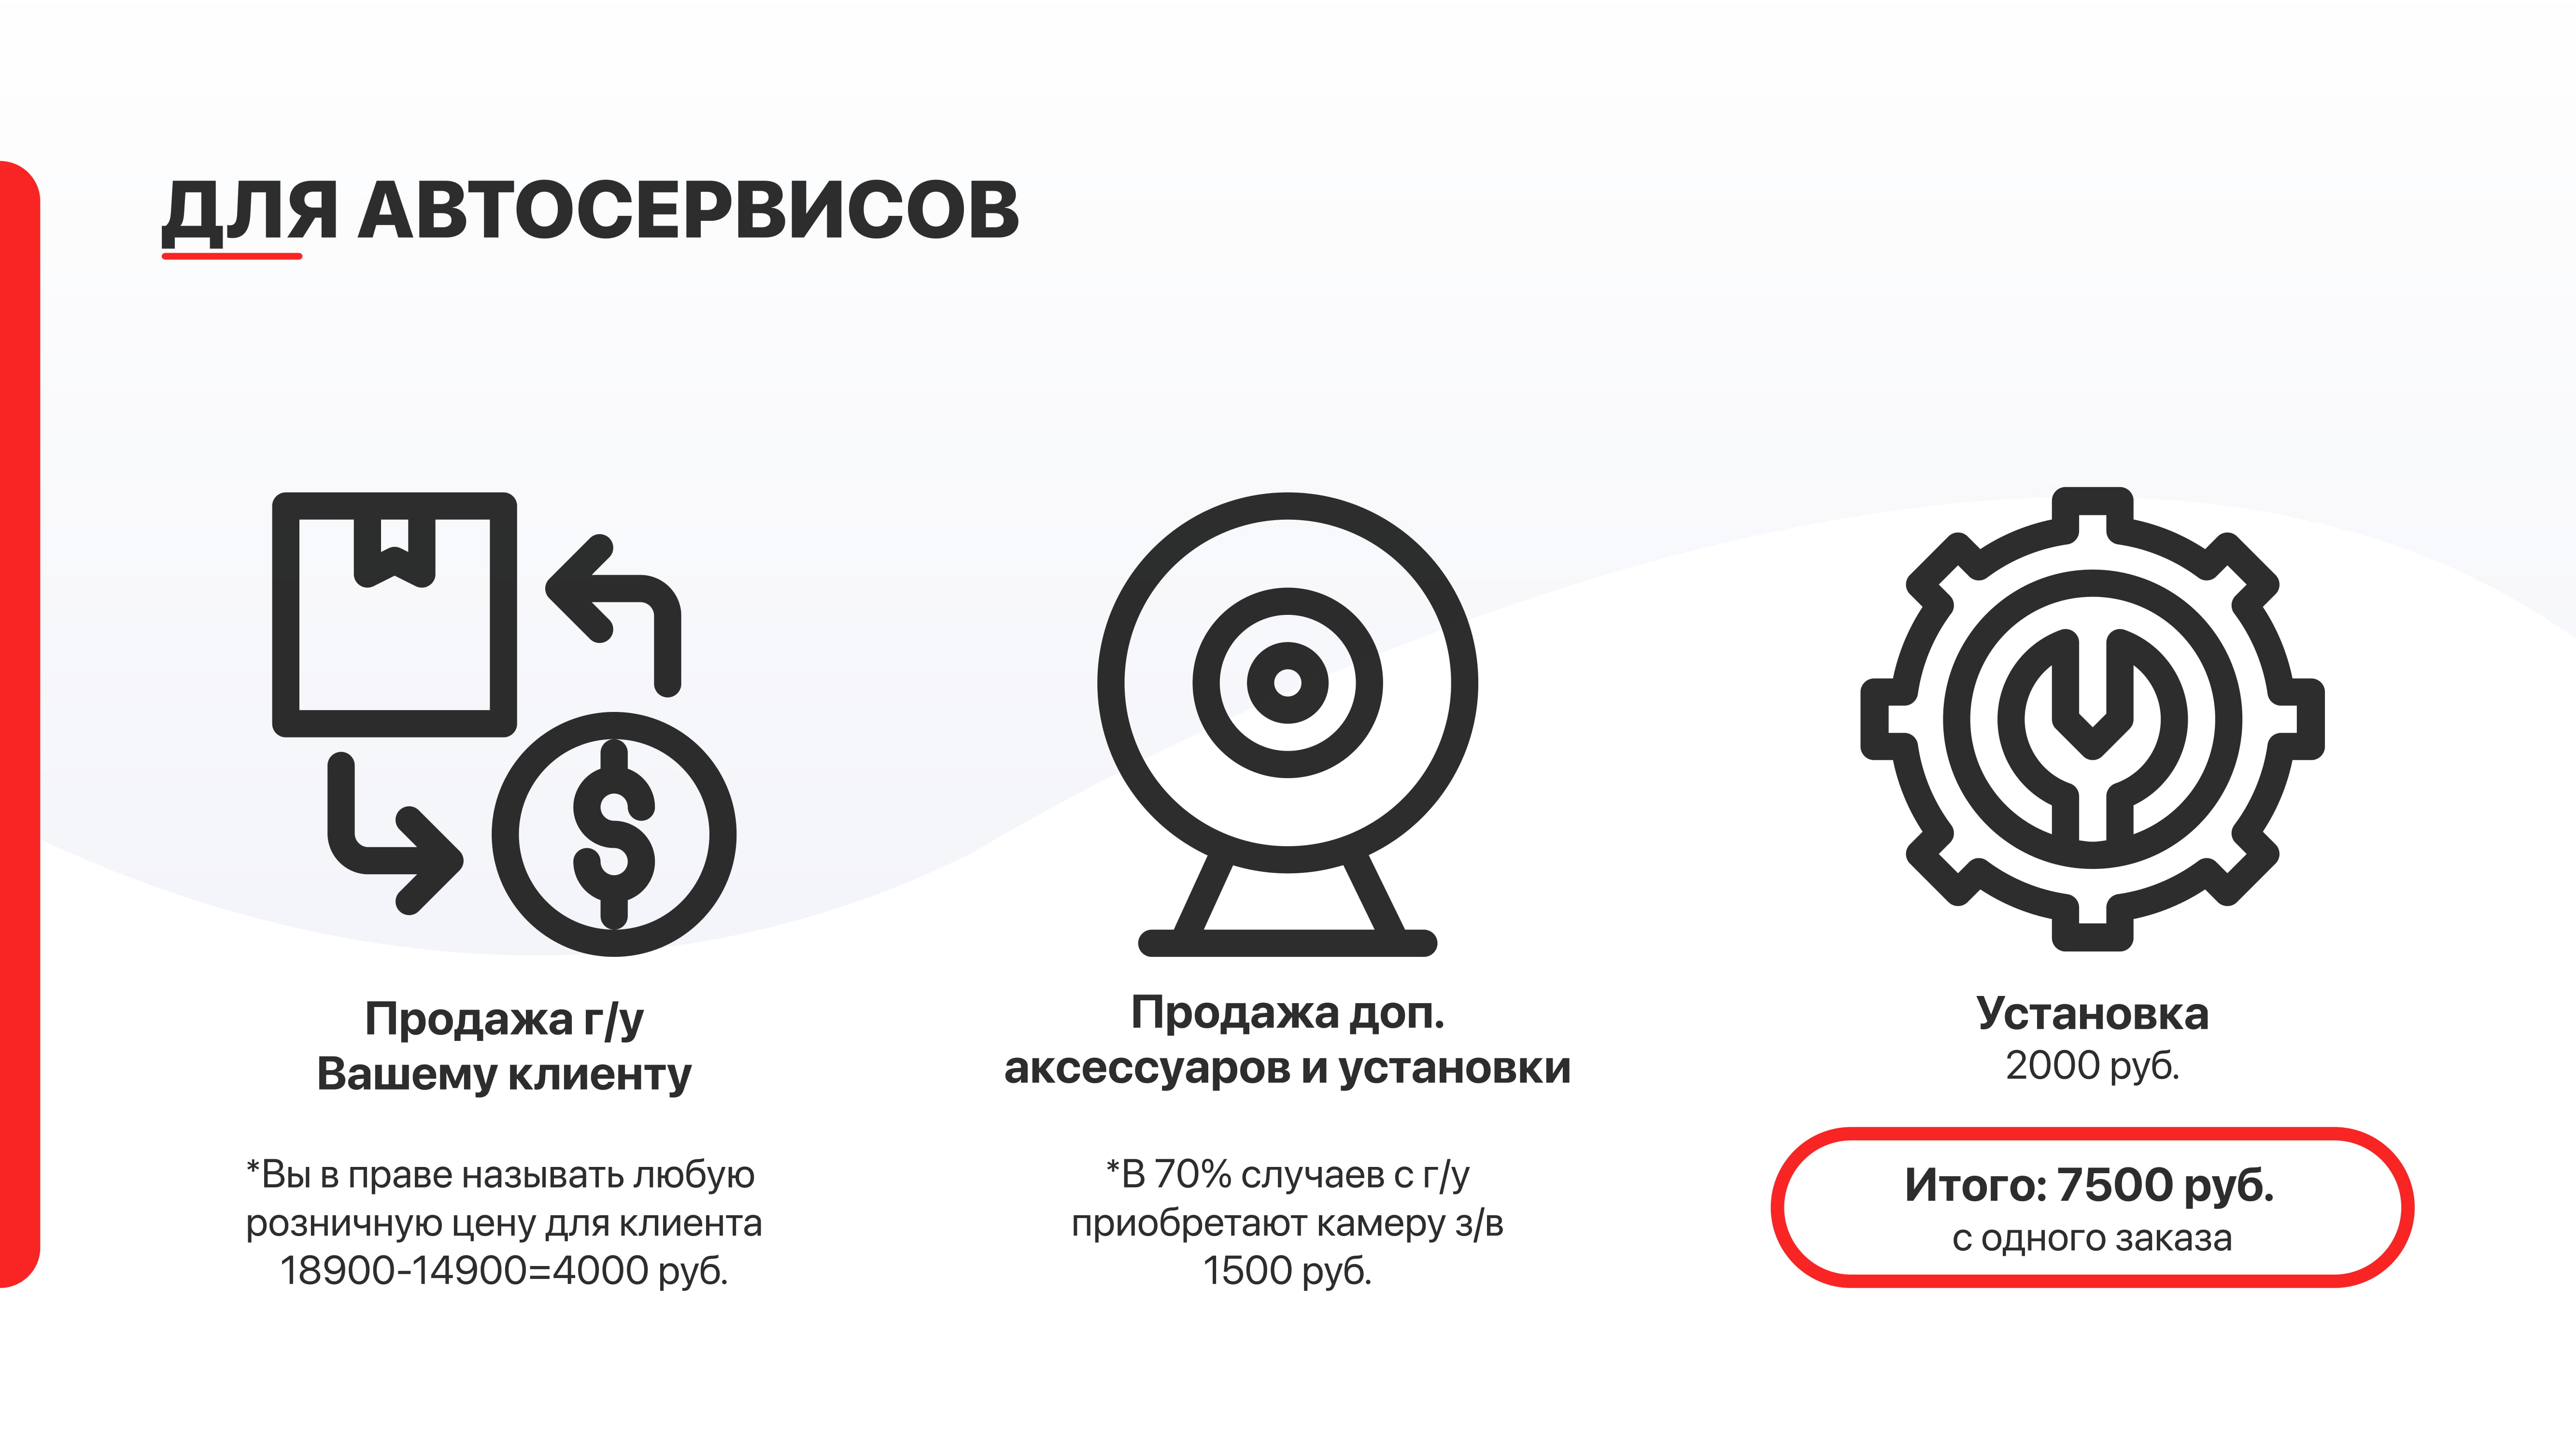 https://audiostart.ru/images/upload/Audio%20Start%20Presentation%20Print-07.jpg